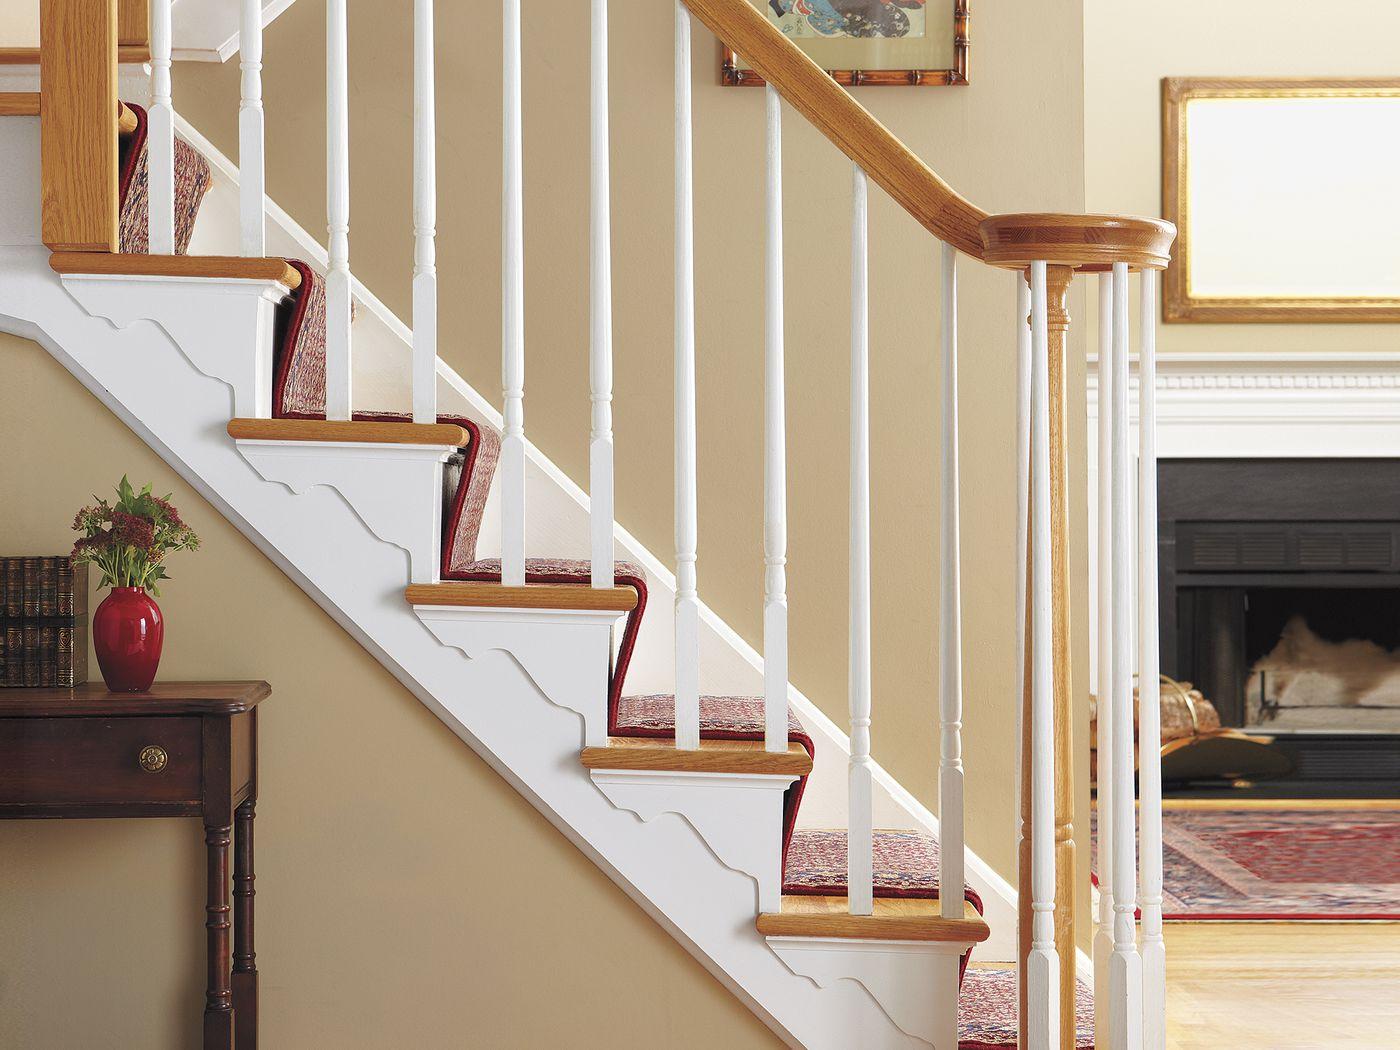 21 Home Improvement Ideas On Budget